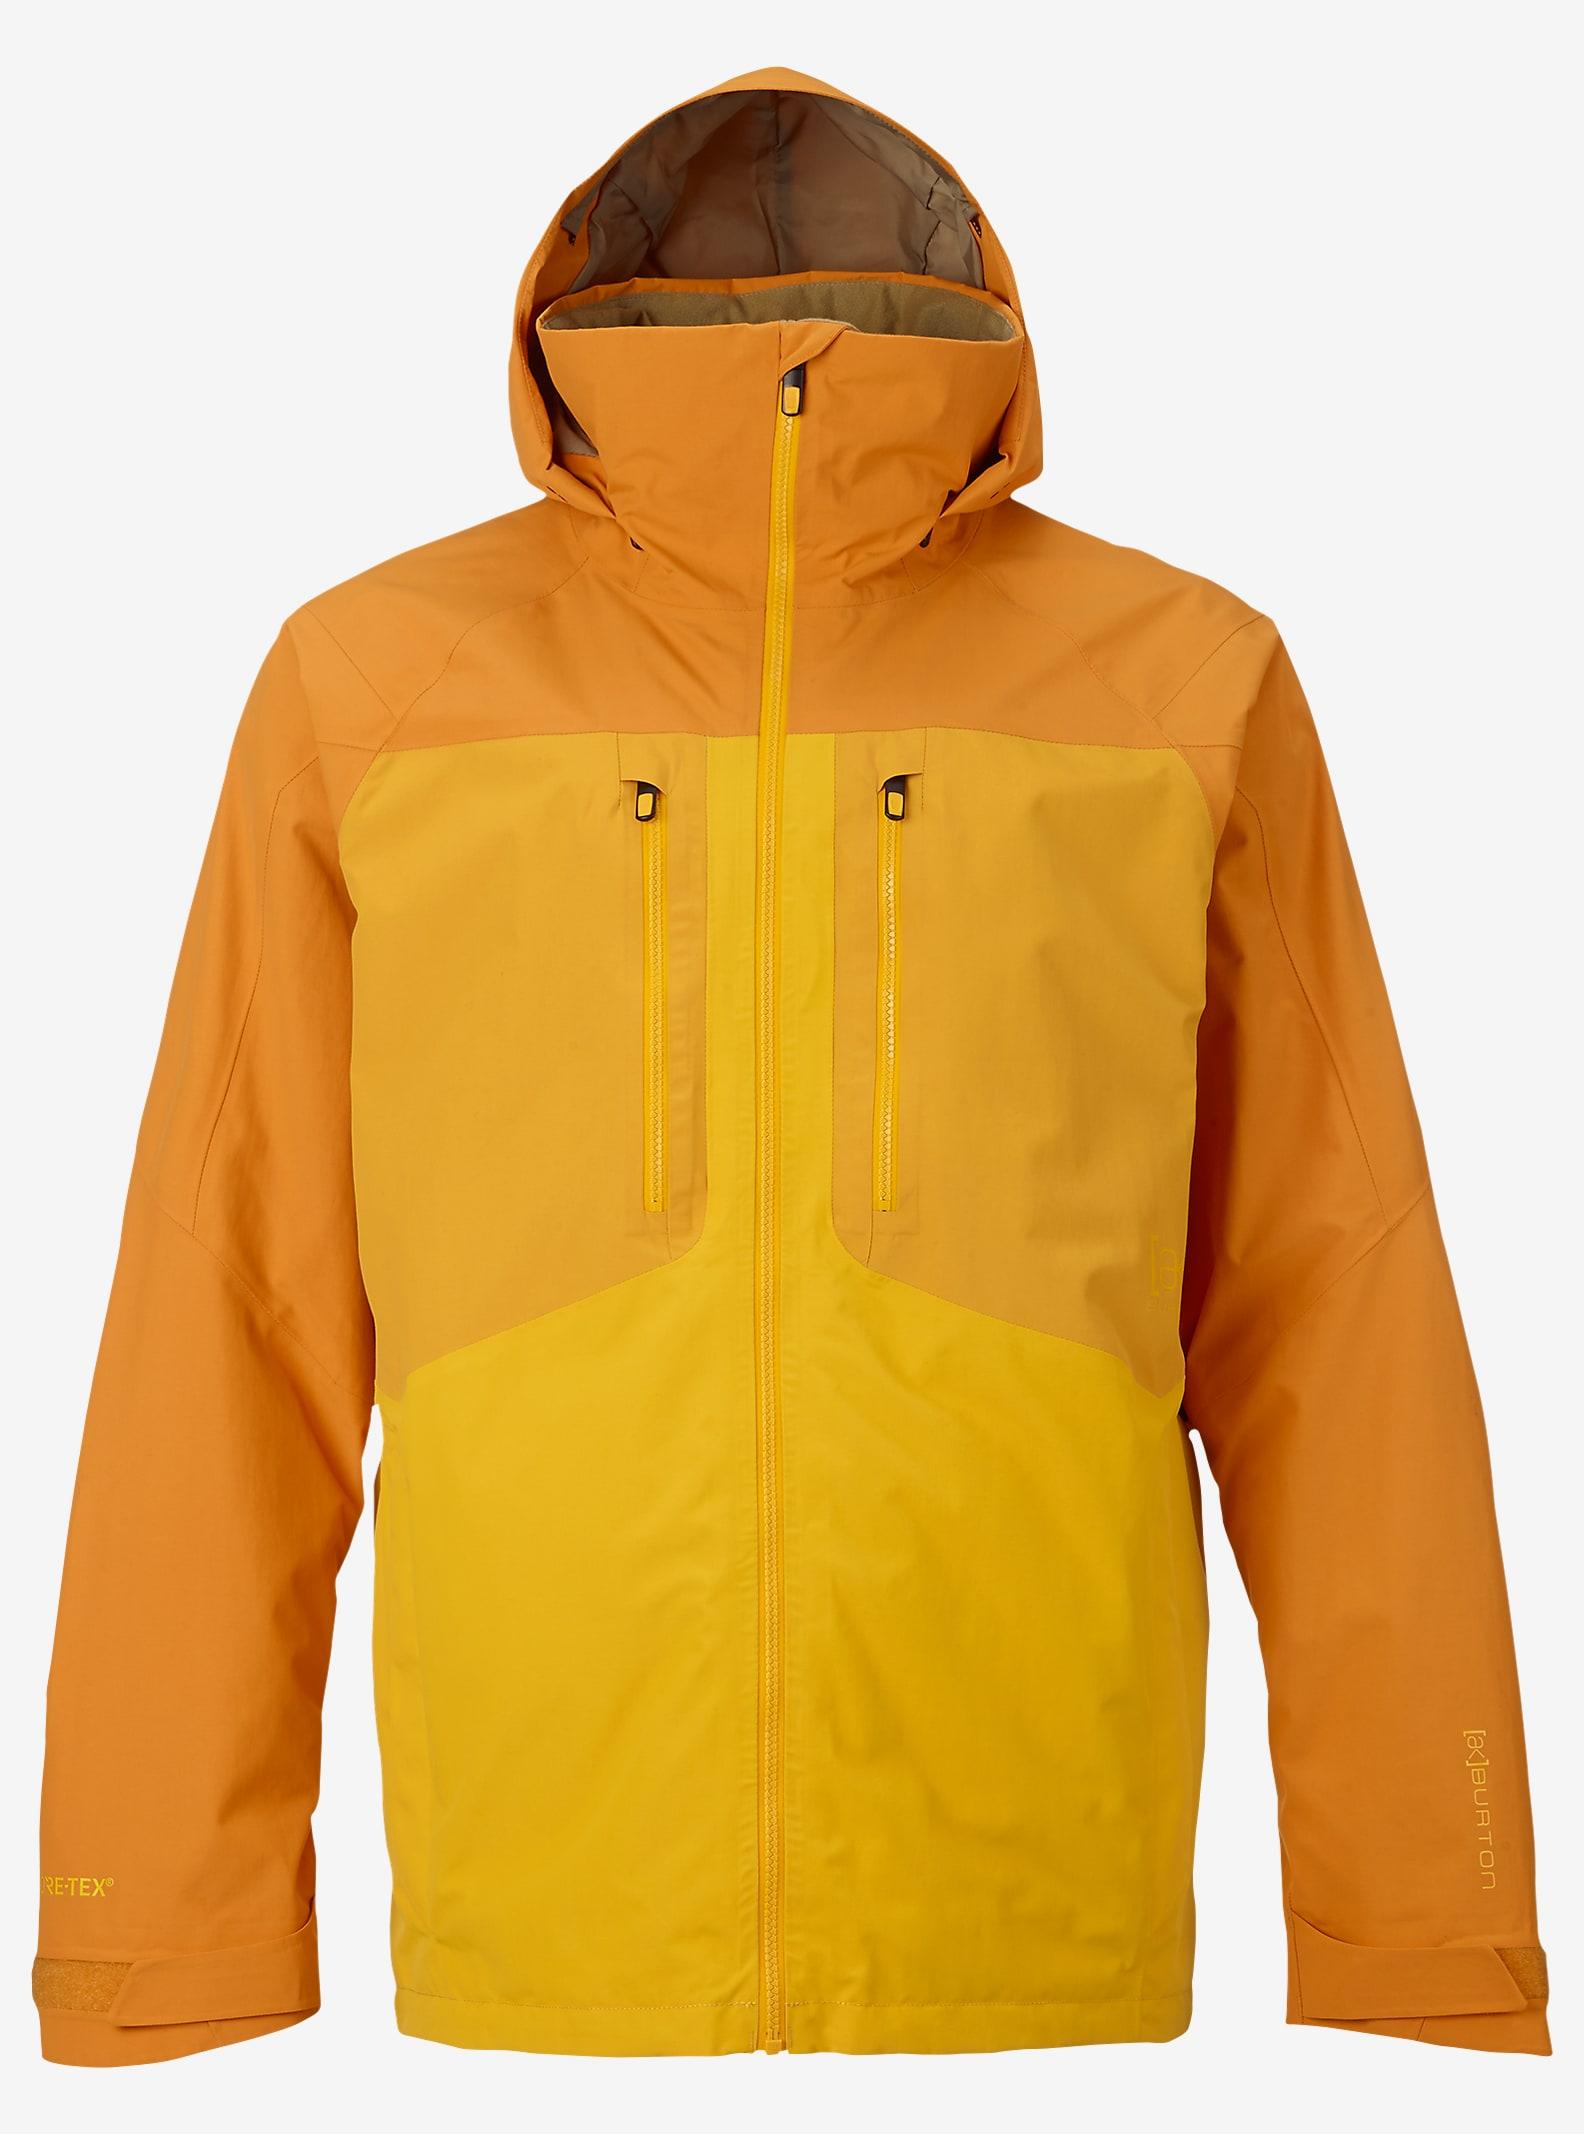 Burton [ak] 2L Swash Jacket shown in Flashback / Burnout / Tripper